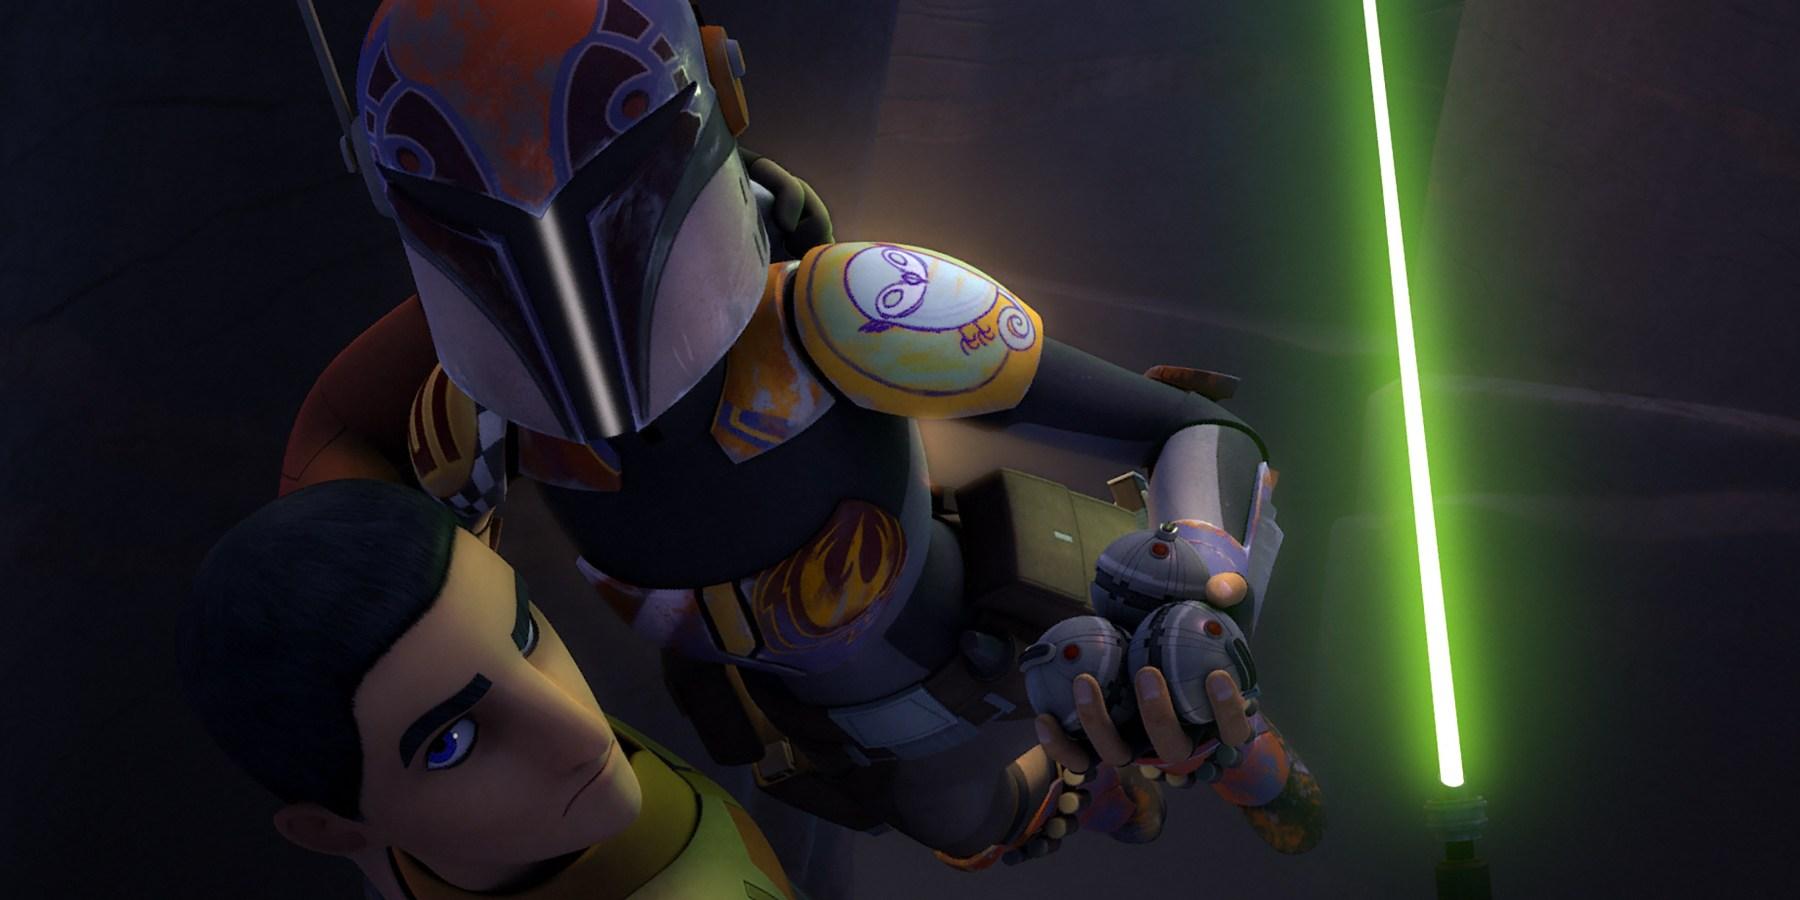 Ezra and Sabine jetpack in Star Wars Rebels